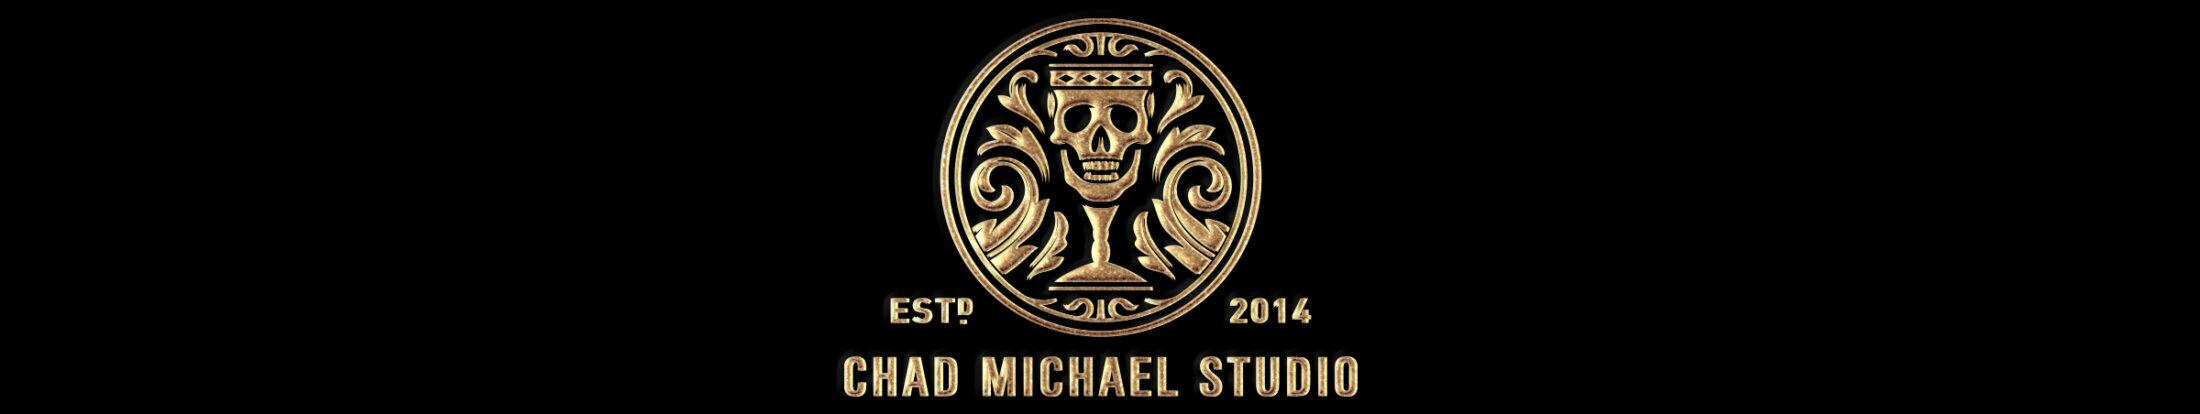 CHAD-MICHAEL-STUDIO